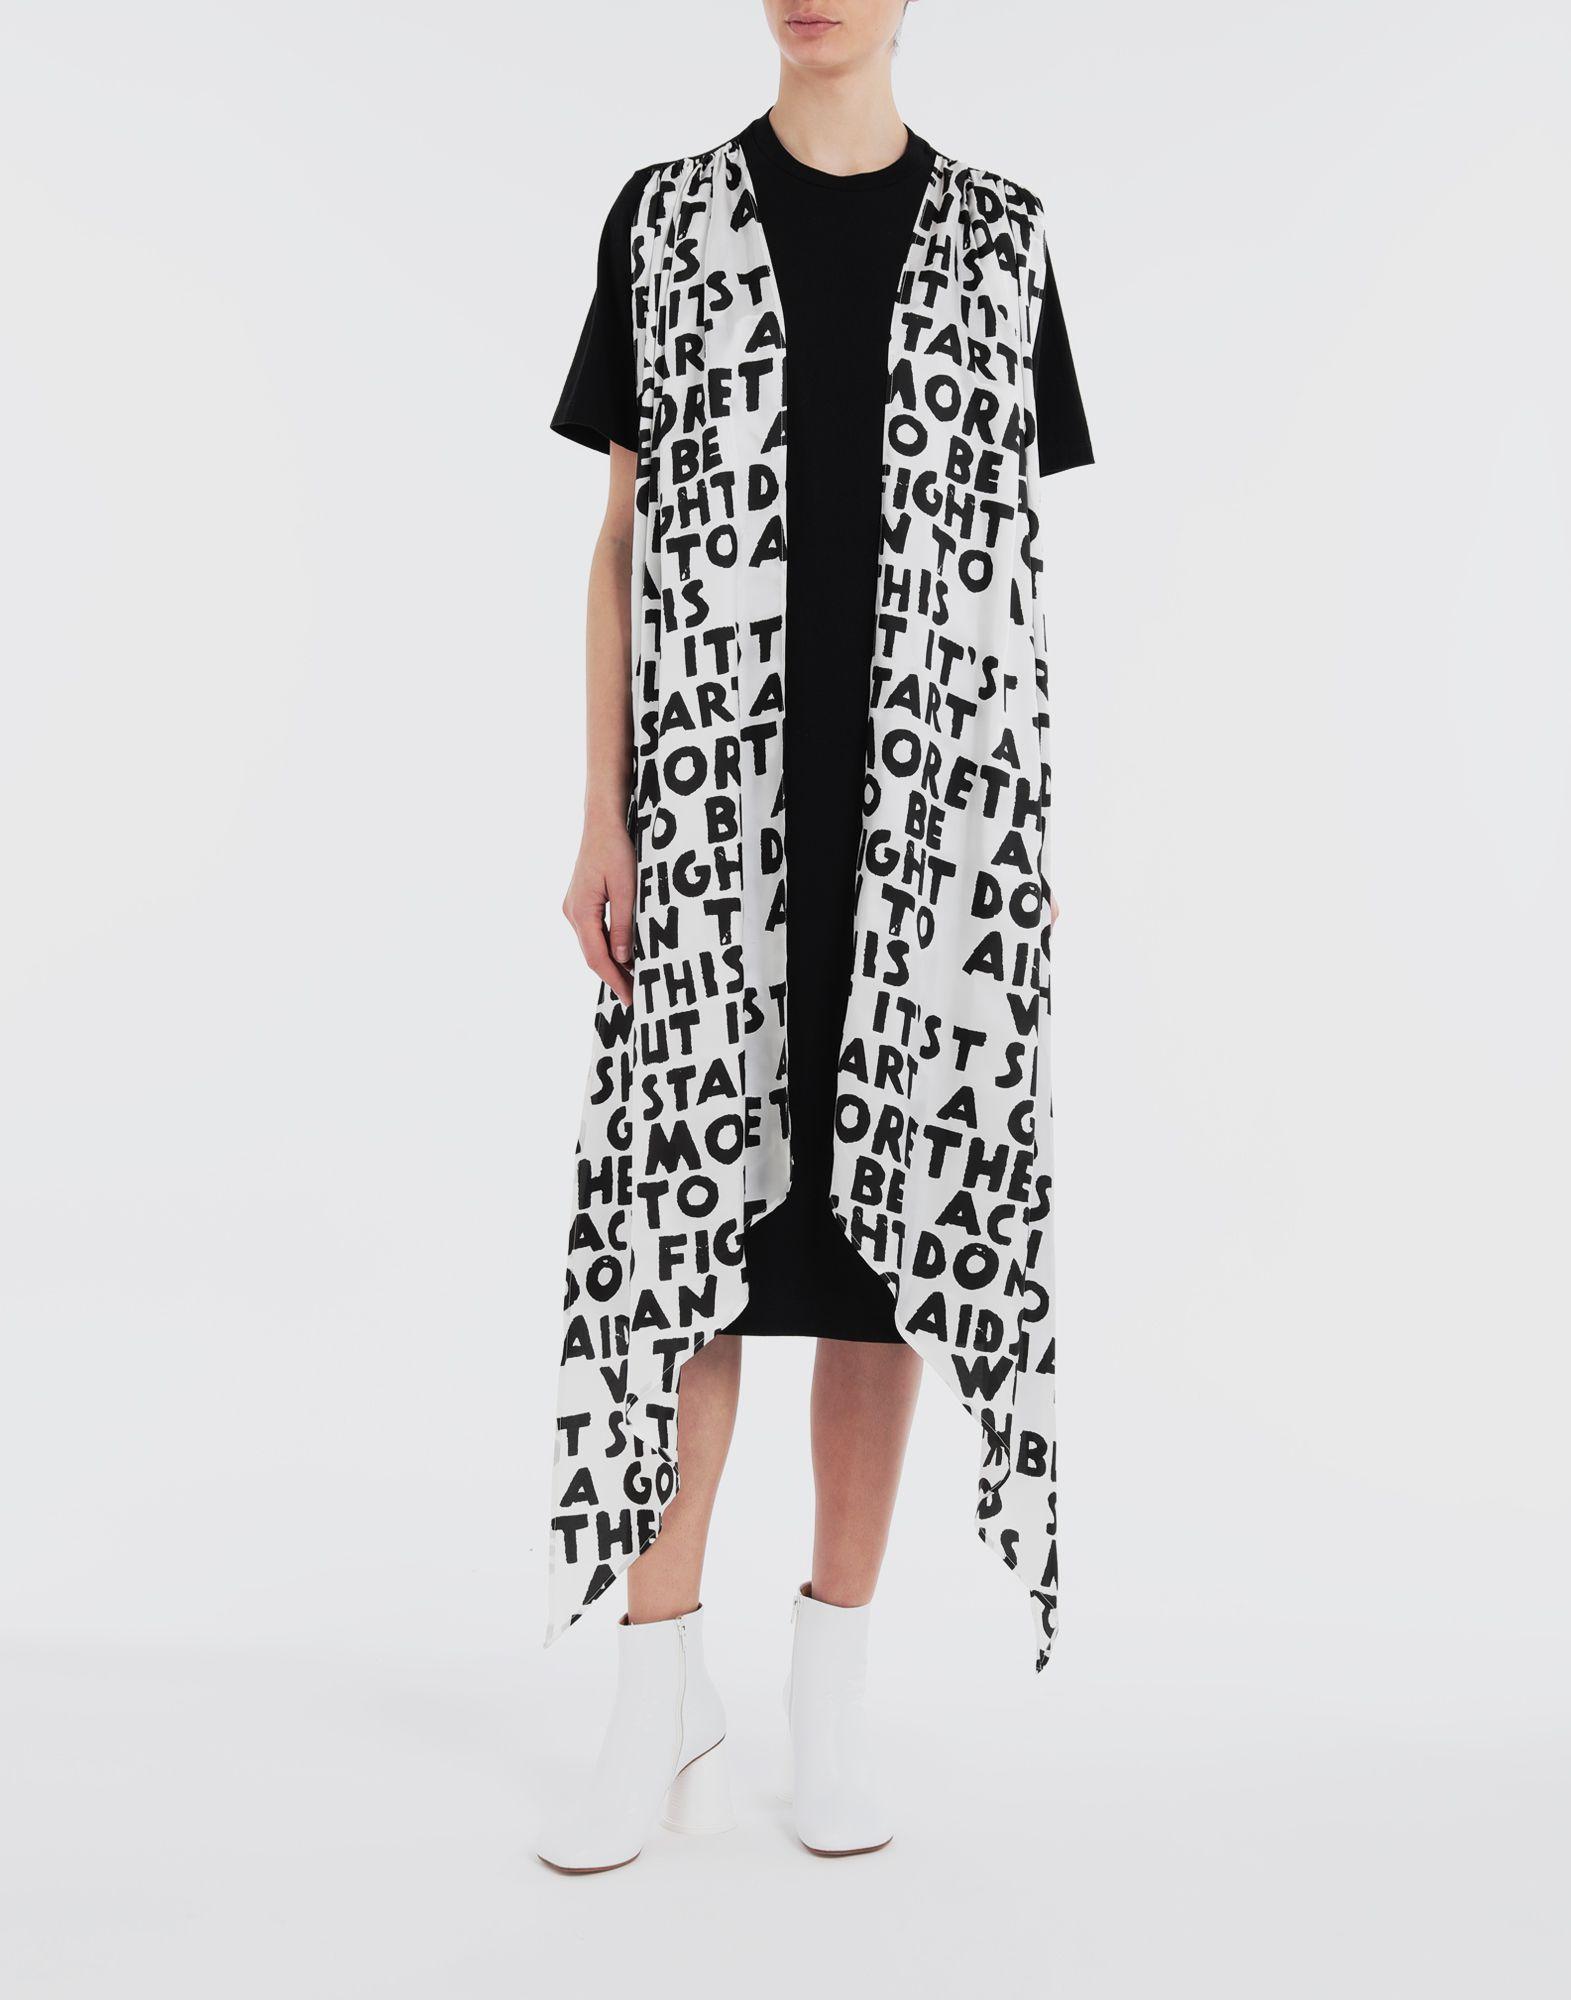 MM6 MAISON MARGIELA Scarf tie dress Short dress Woman d